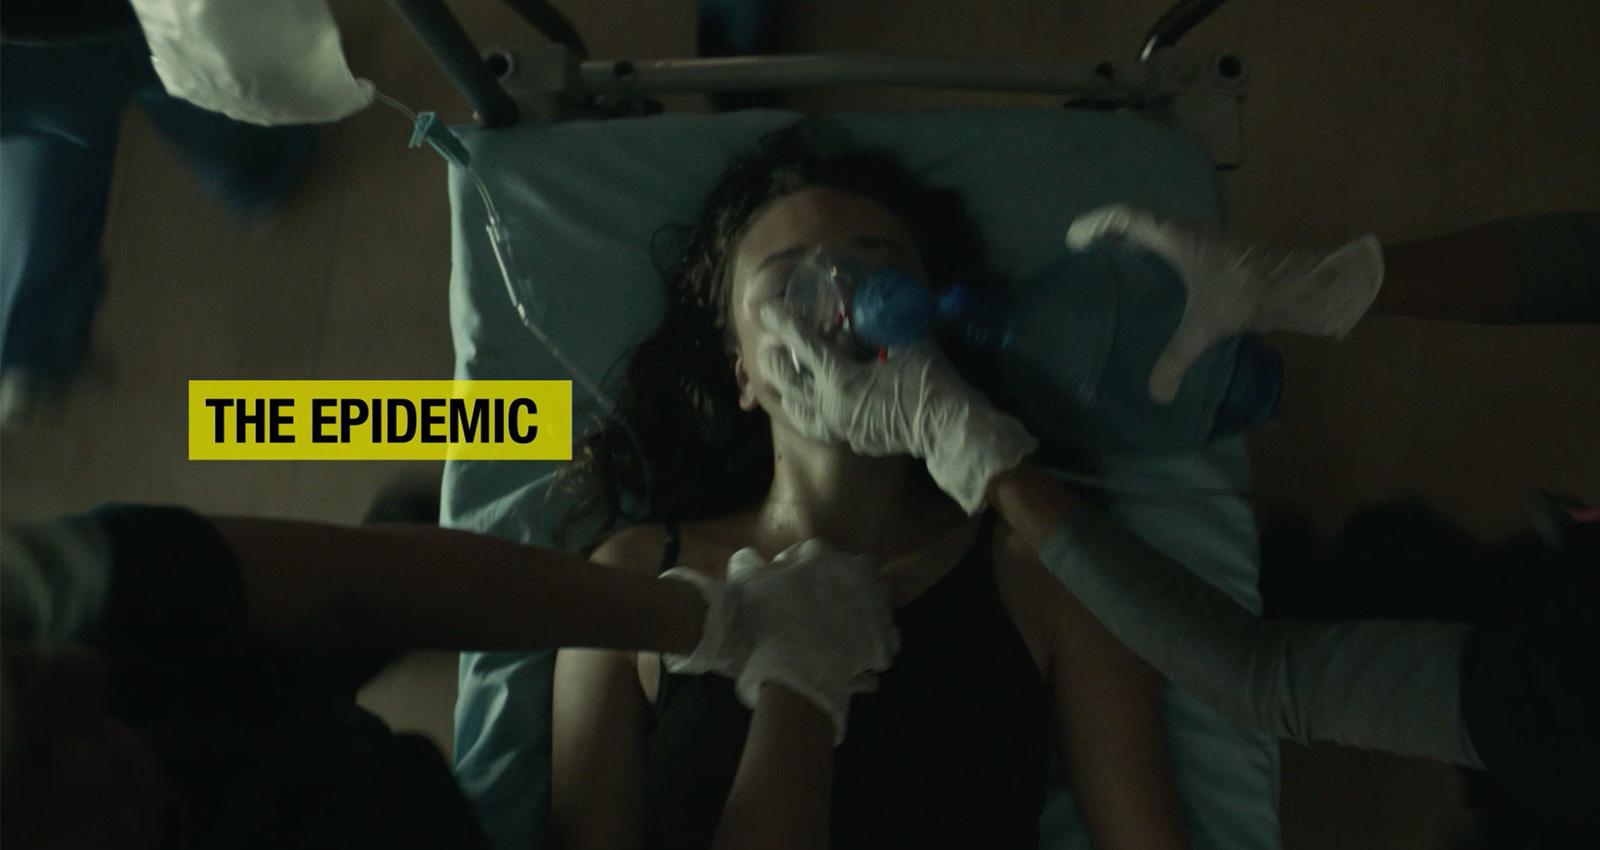 Monica Lewinsky - The Epidemic